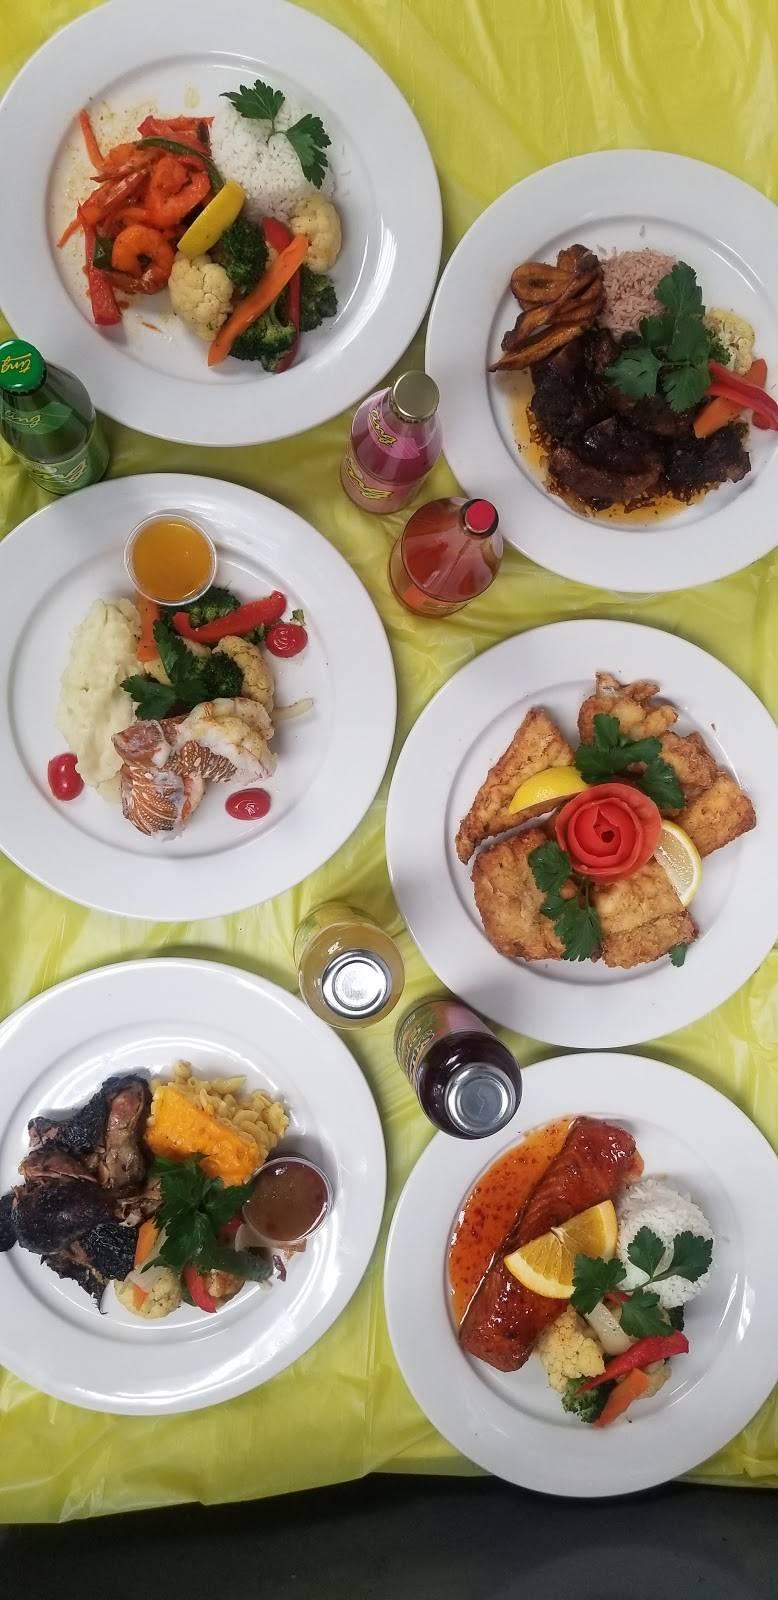 Rustys Flavor | restaurant | 2261 Adam Clayton Powell Jr Blvd, New York, NY 10030, USA | 2123683403 OR +1 212-368-3403